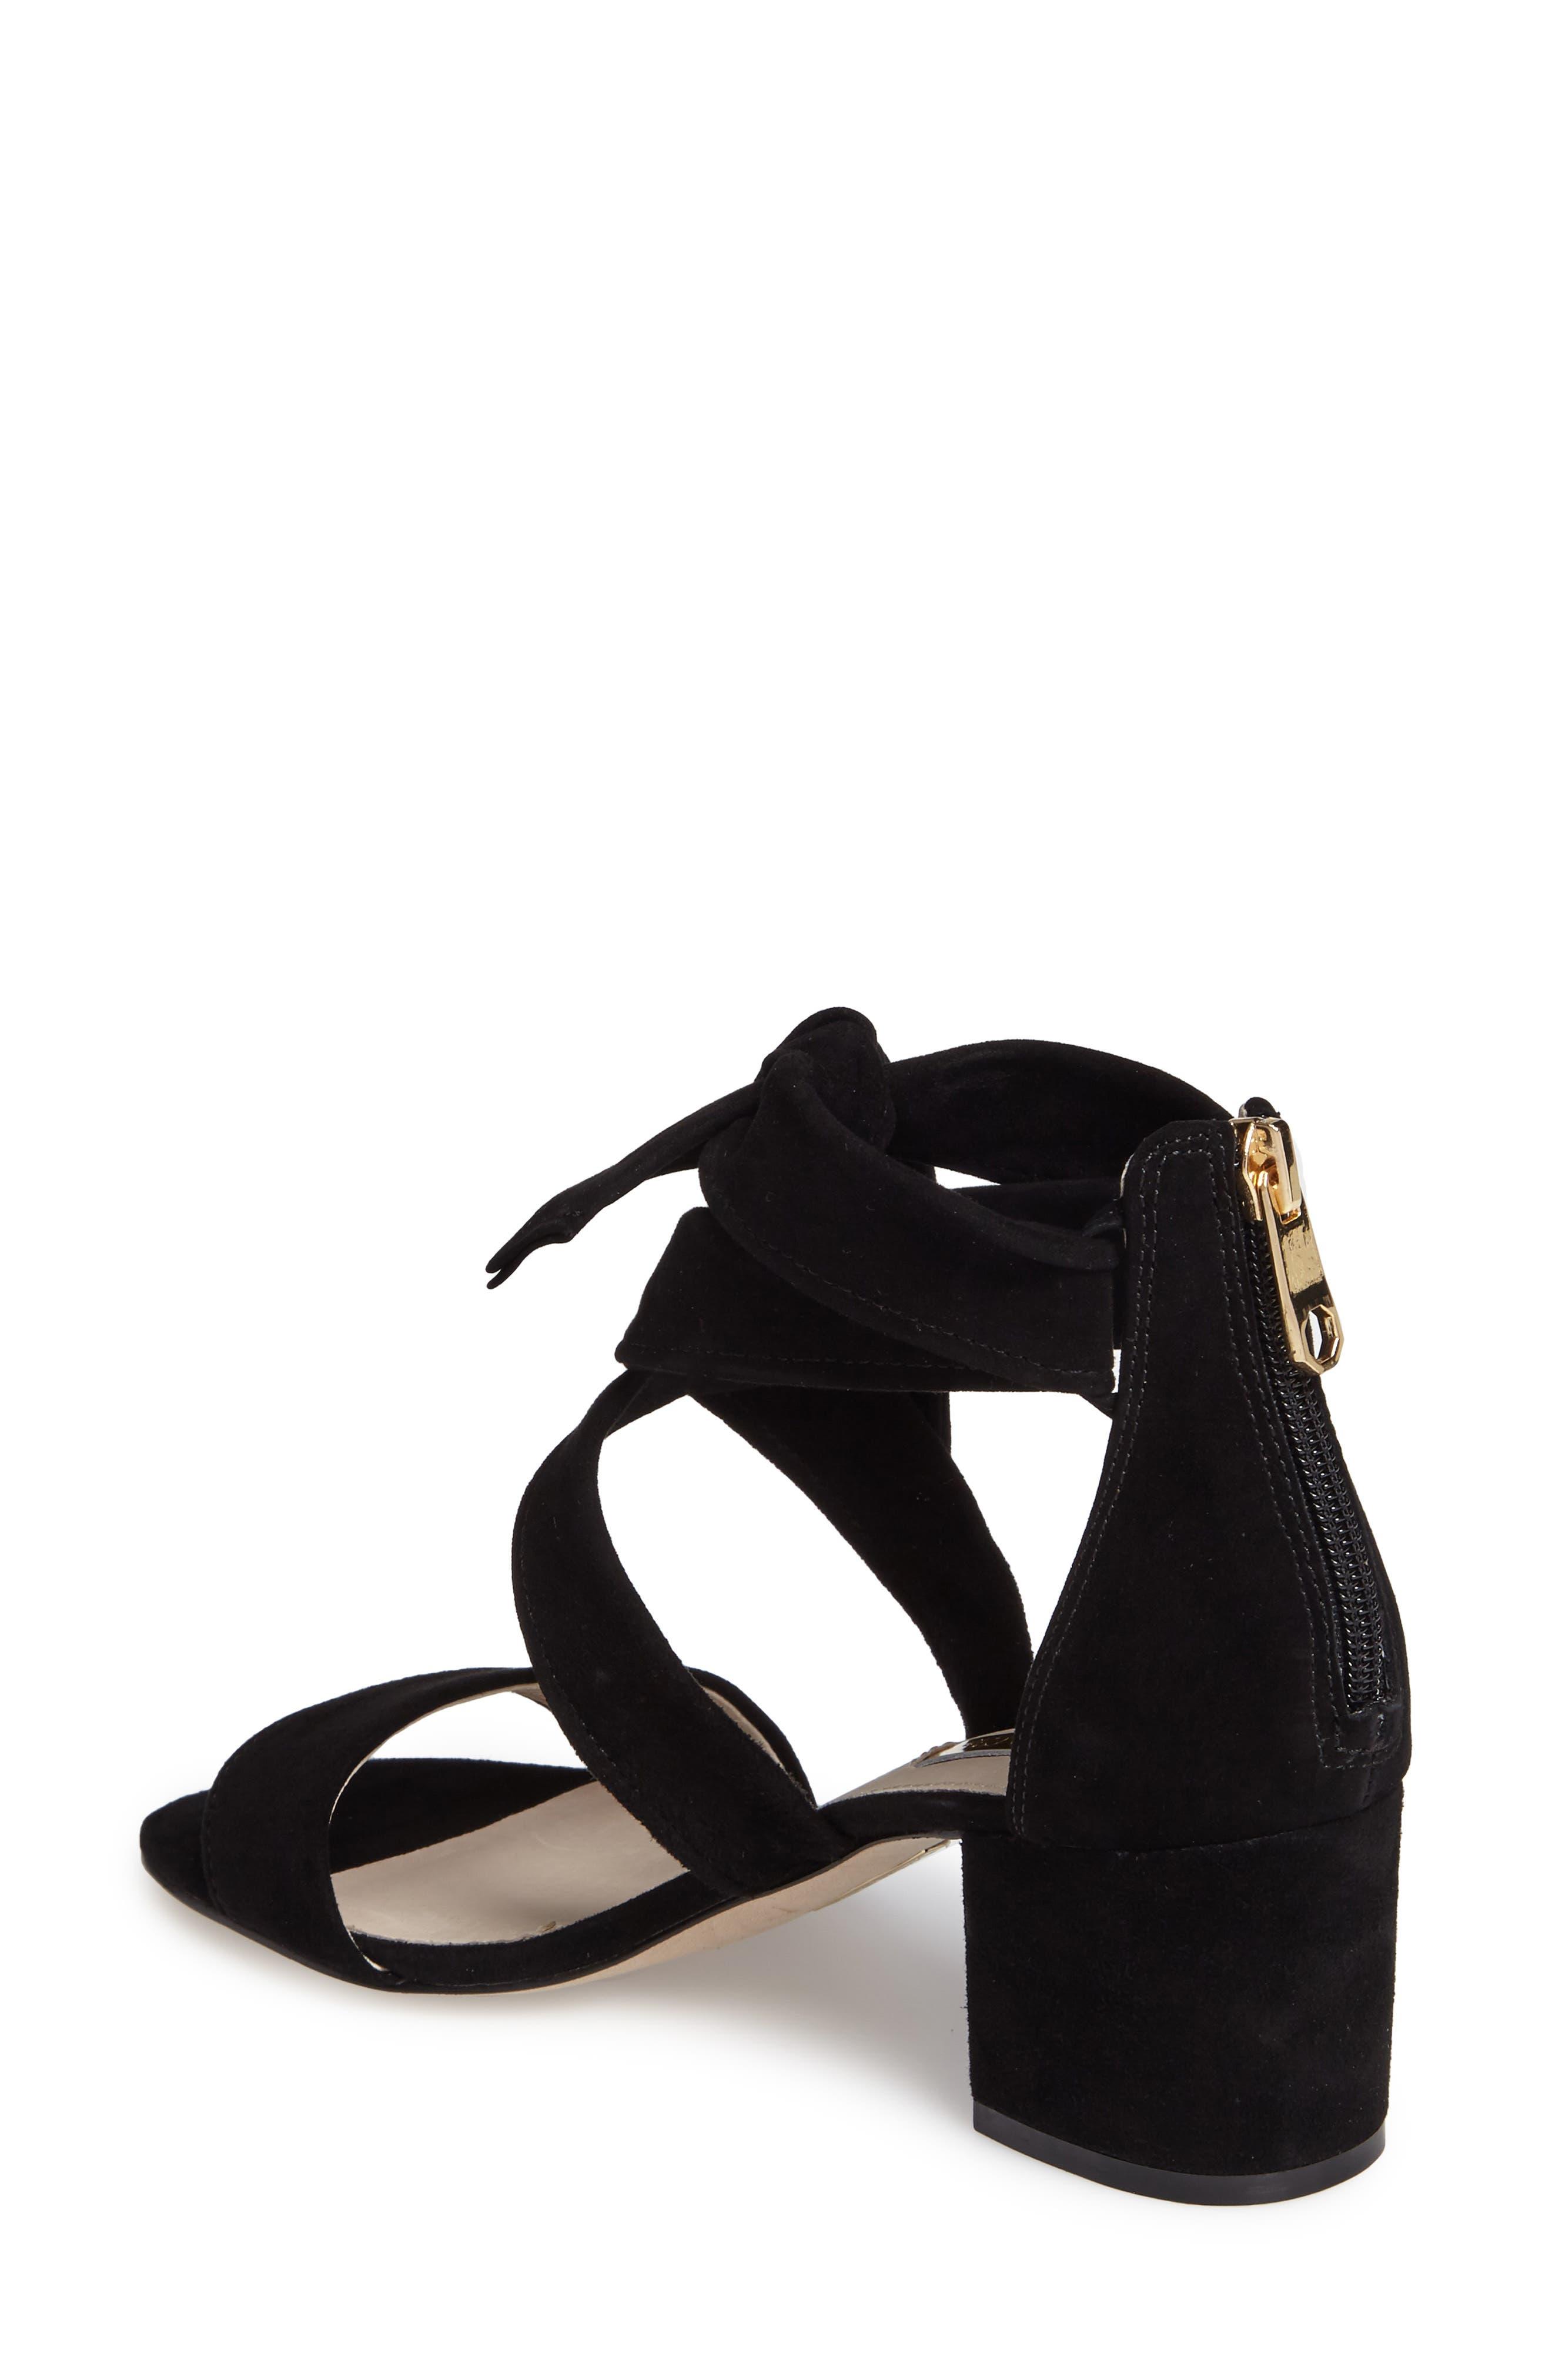 Gia Block Heel Sandal,                             Alternate thumbnail 2, color,                             001